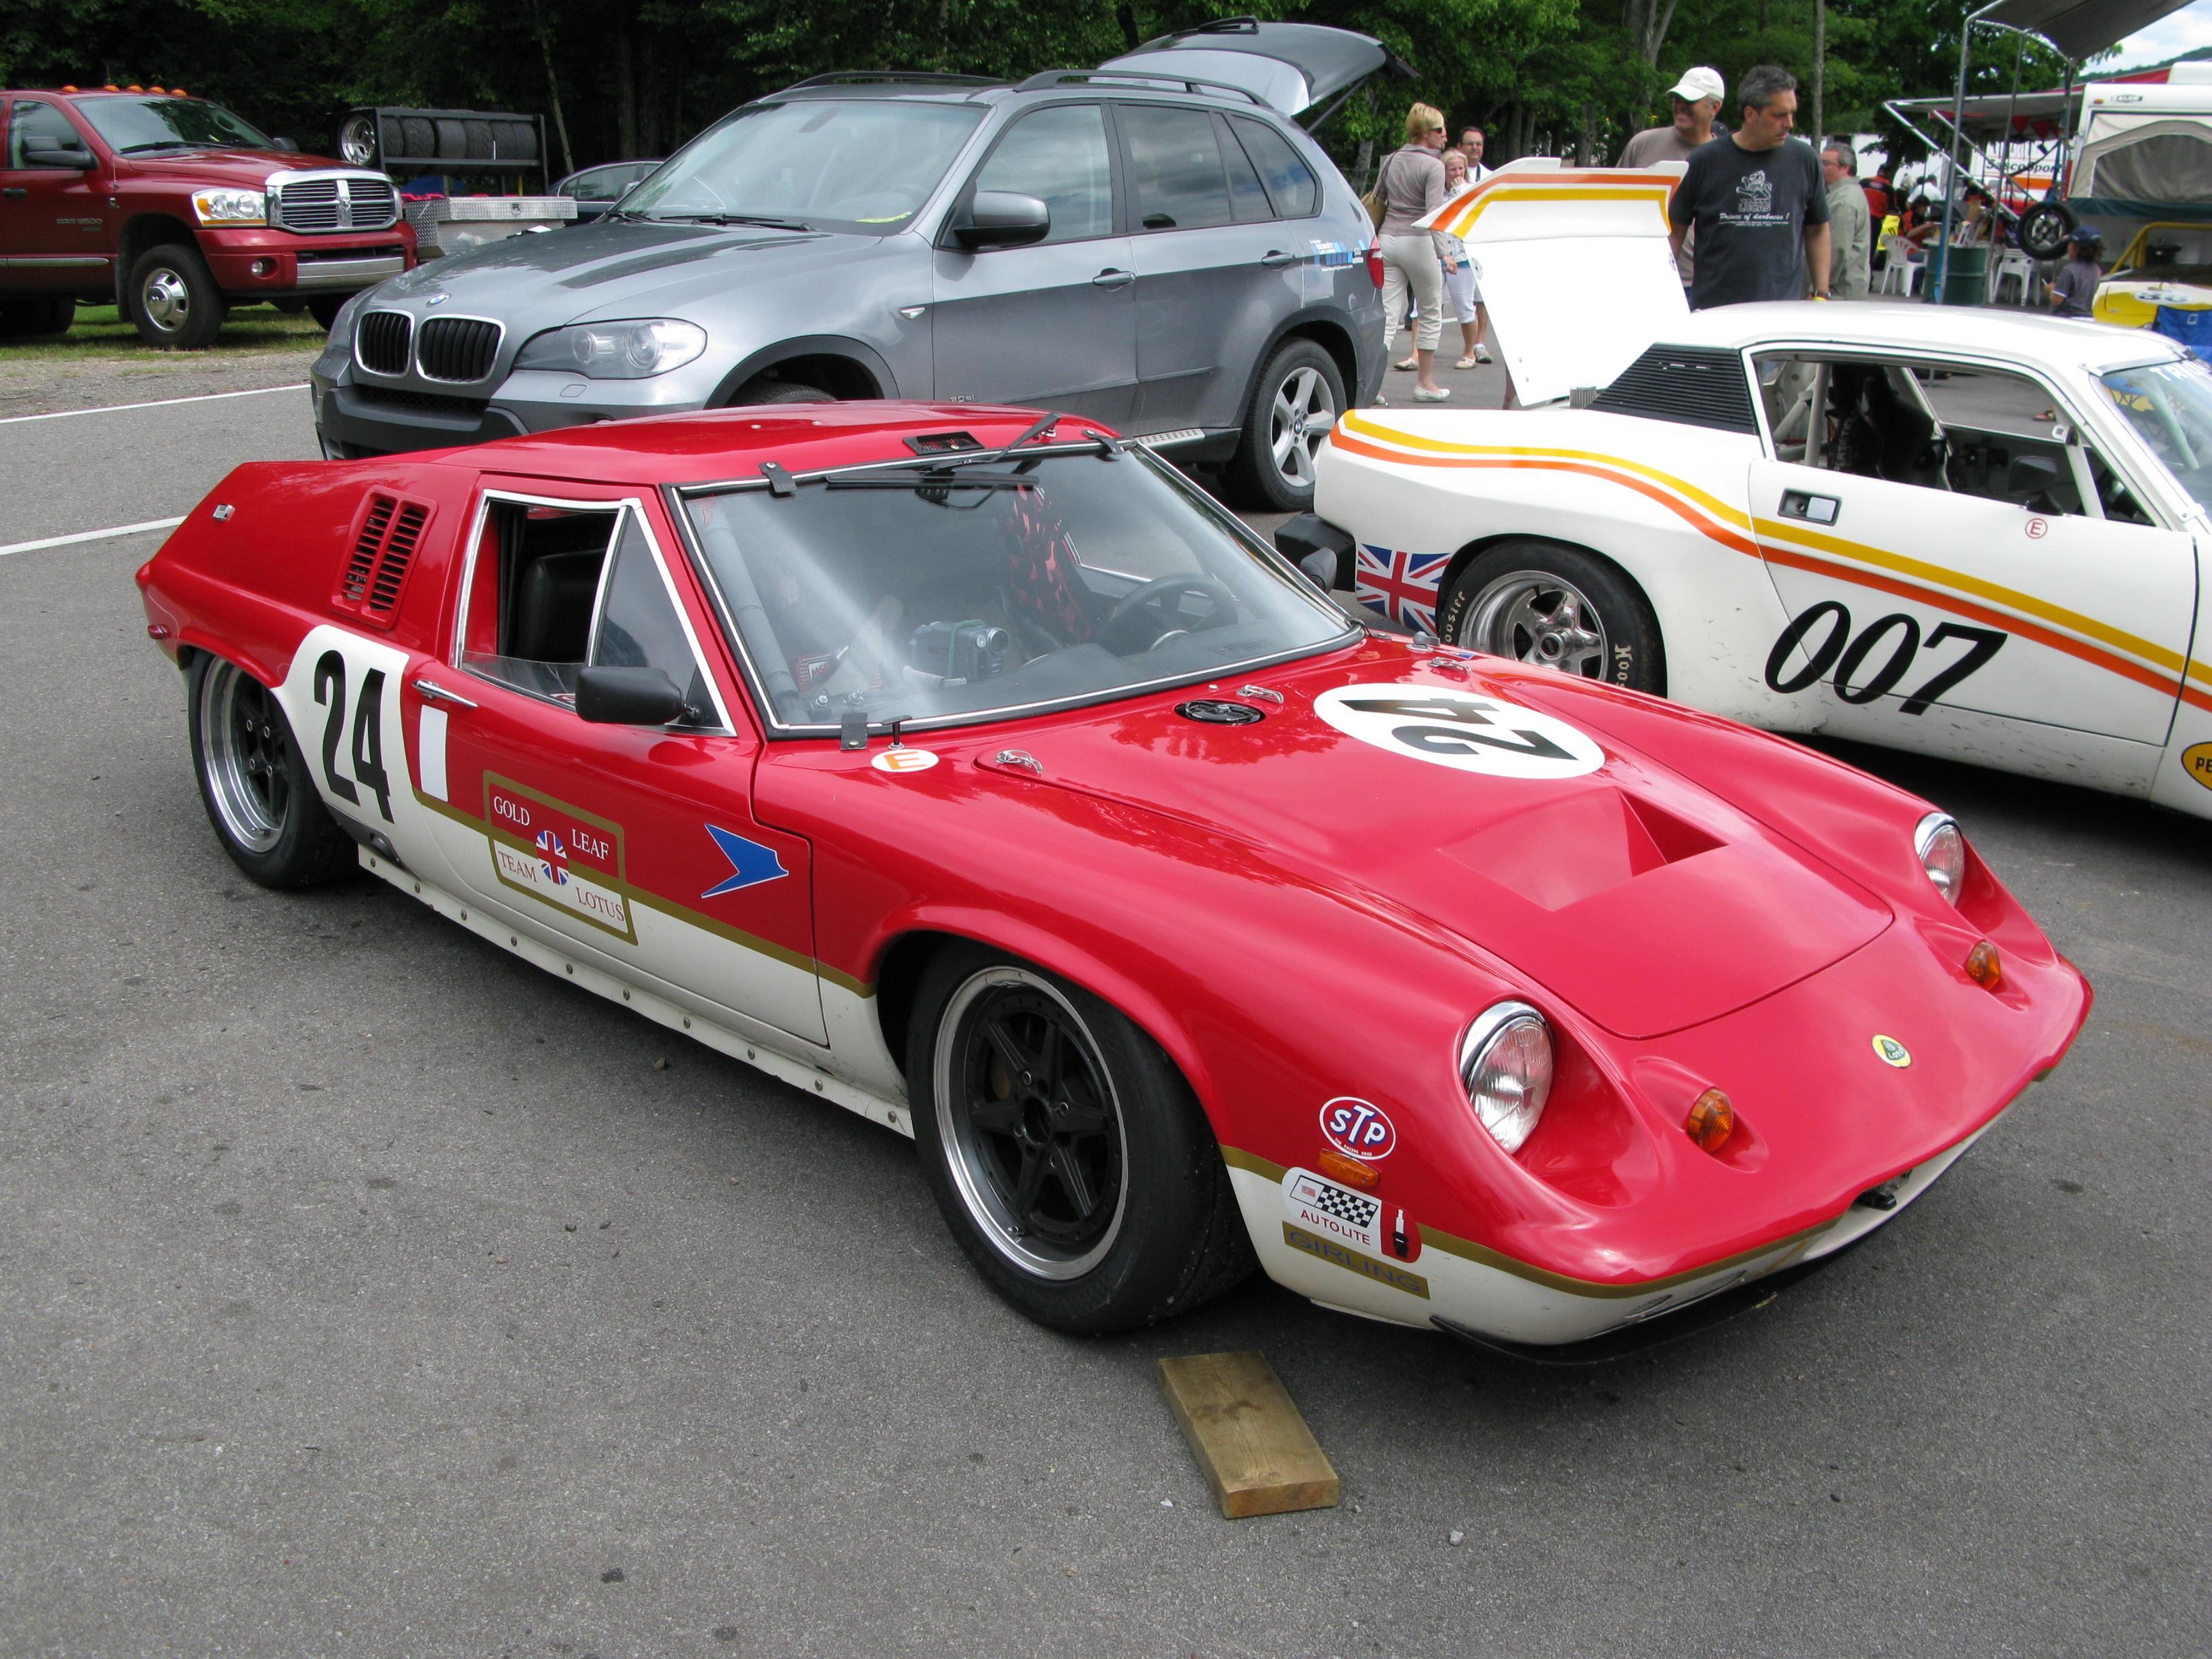 Lotus 47 Europa group 4 (1967) - Racing Cars